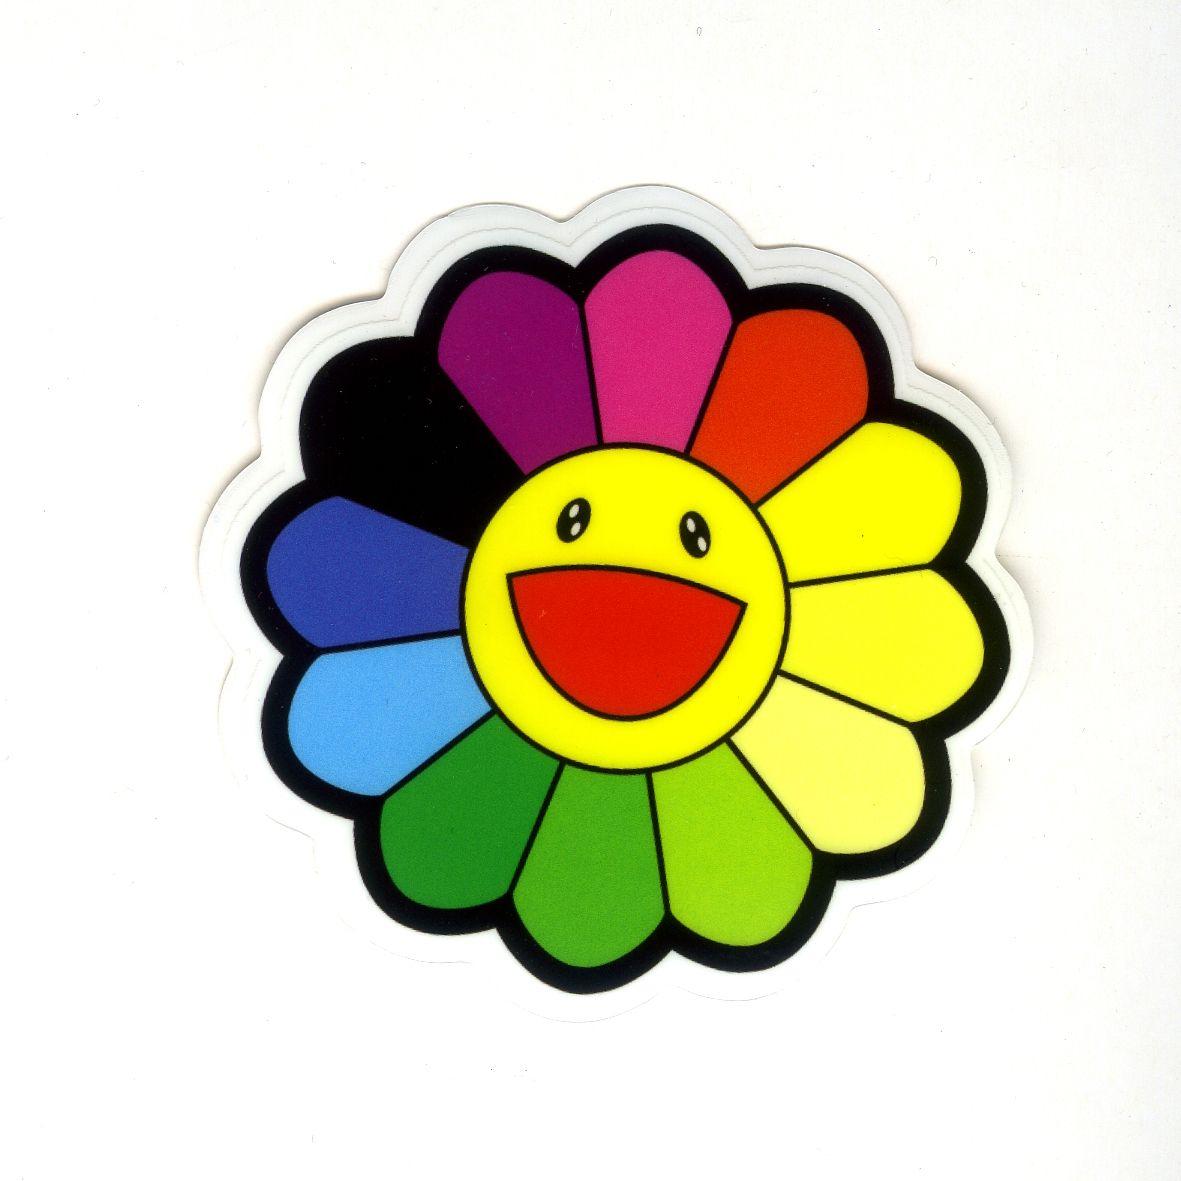 1071 Takashi Murakami Rainbow Daisy Flower Width 8 Cm